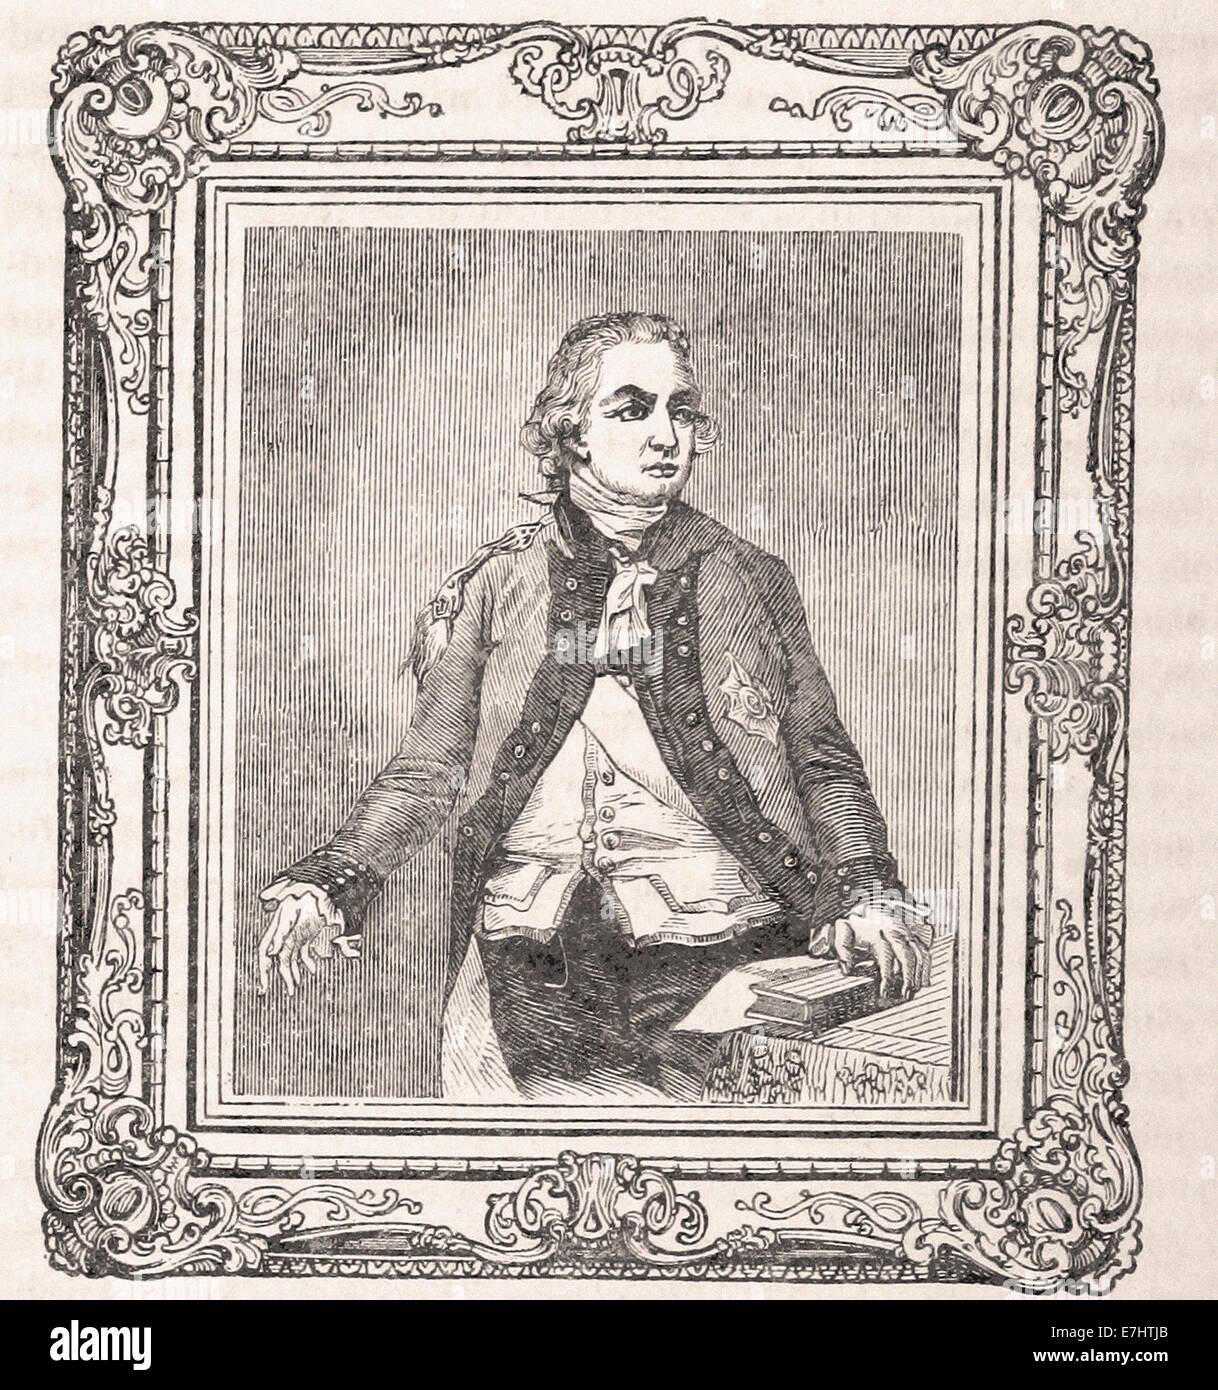 Porträt von Sir Henry Clinton - Gravur - XIX. Jahrhundert Stockbild